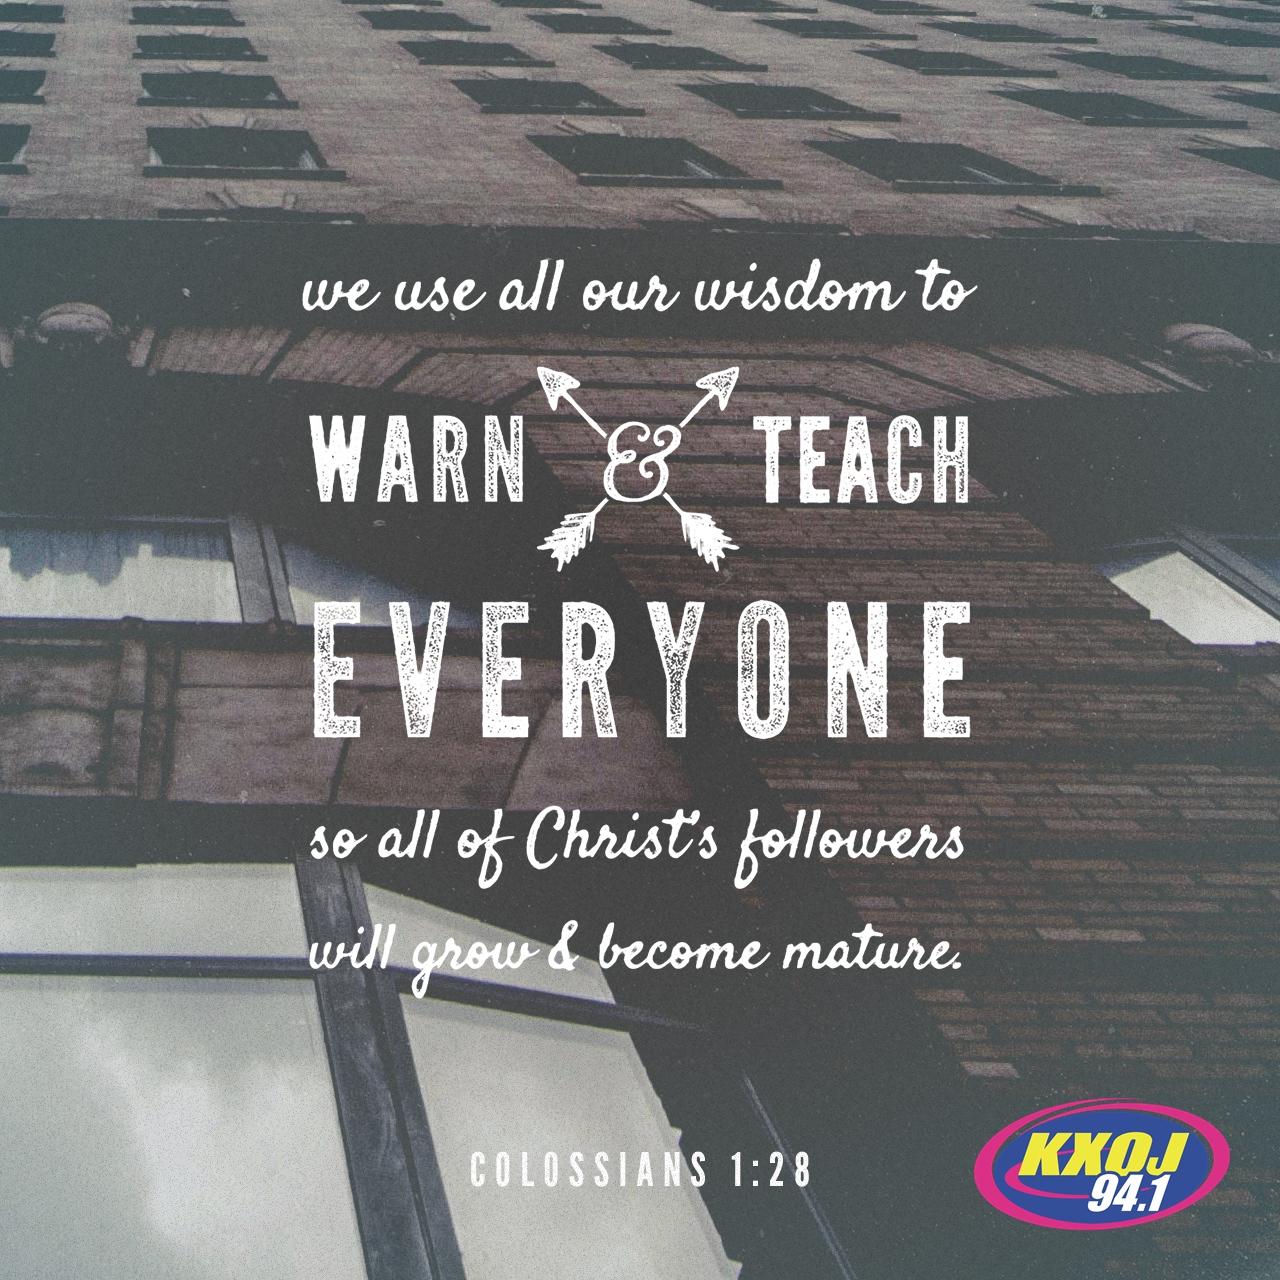 January 13th - Colossians 1:28